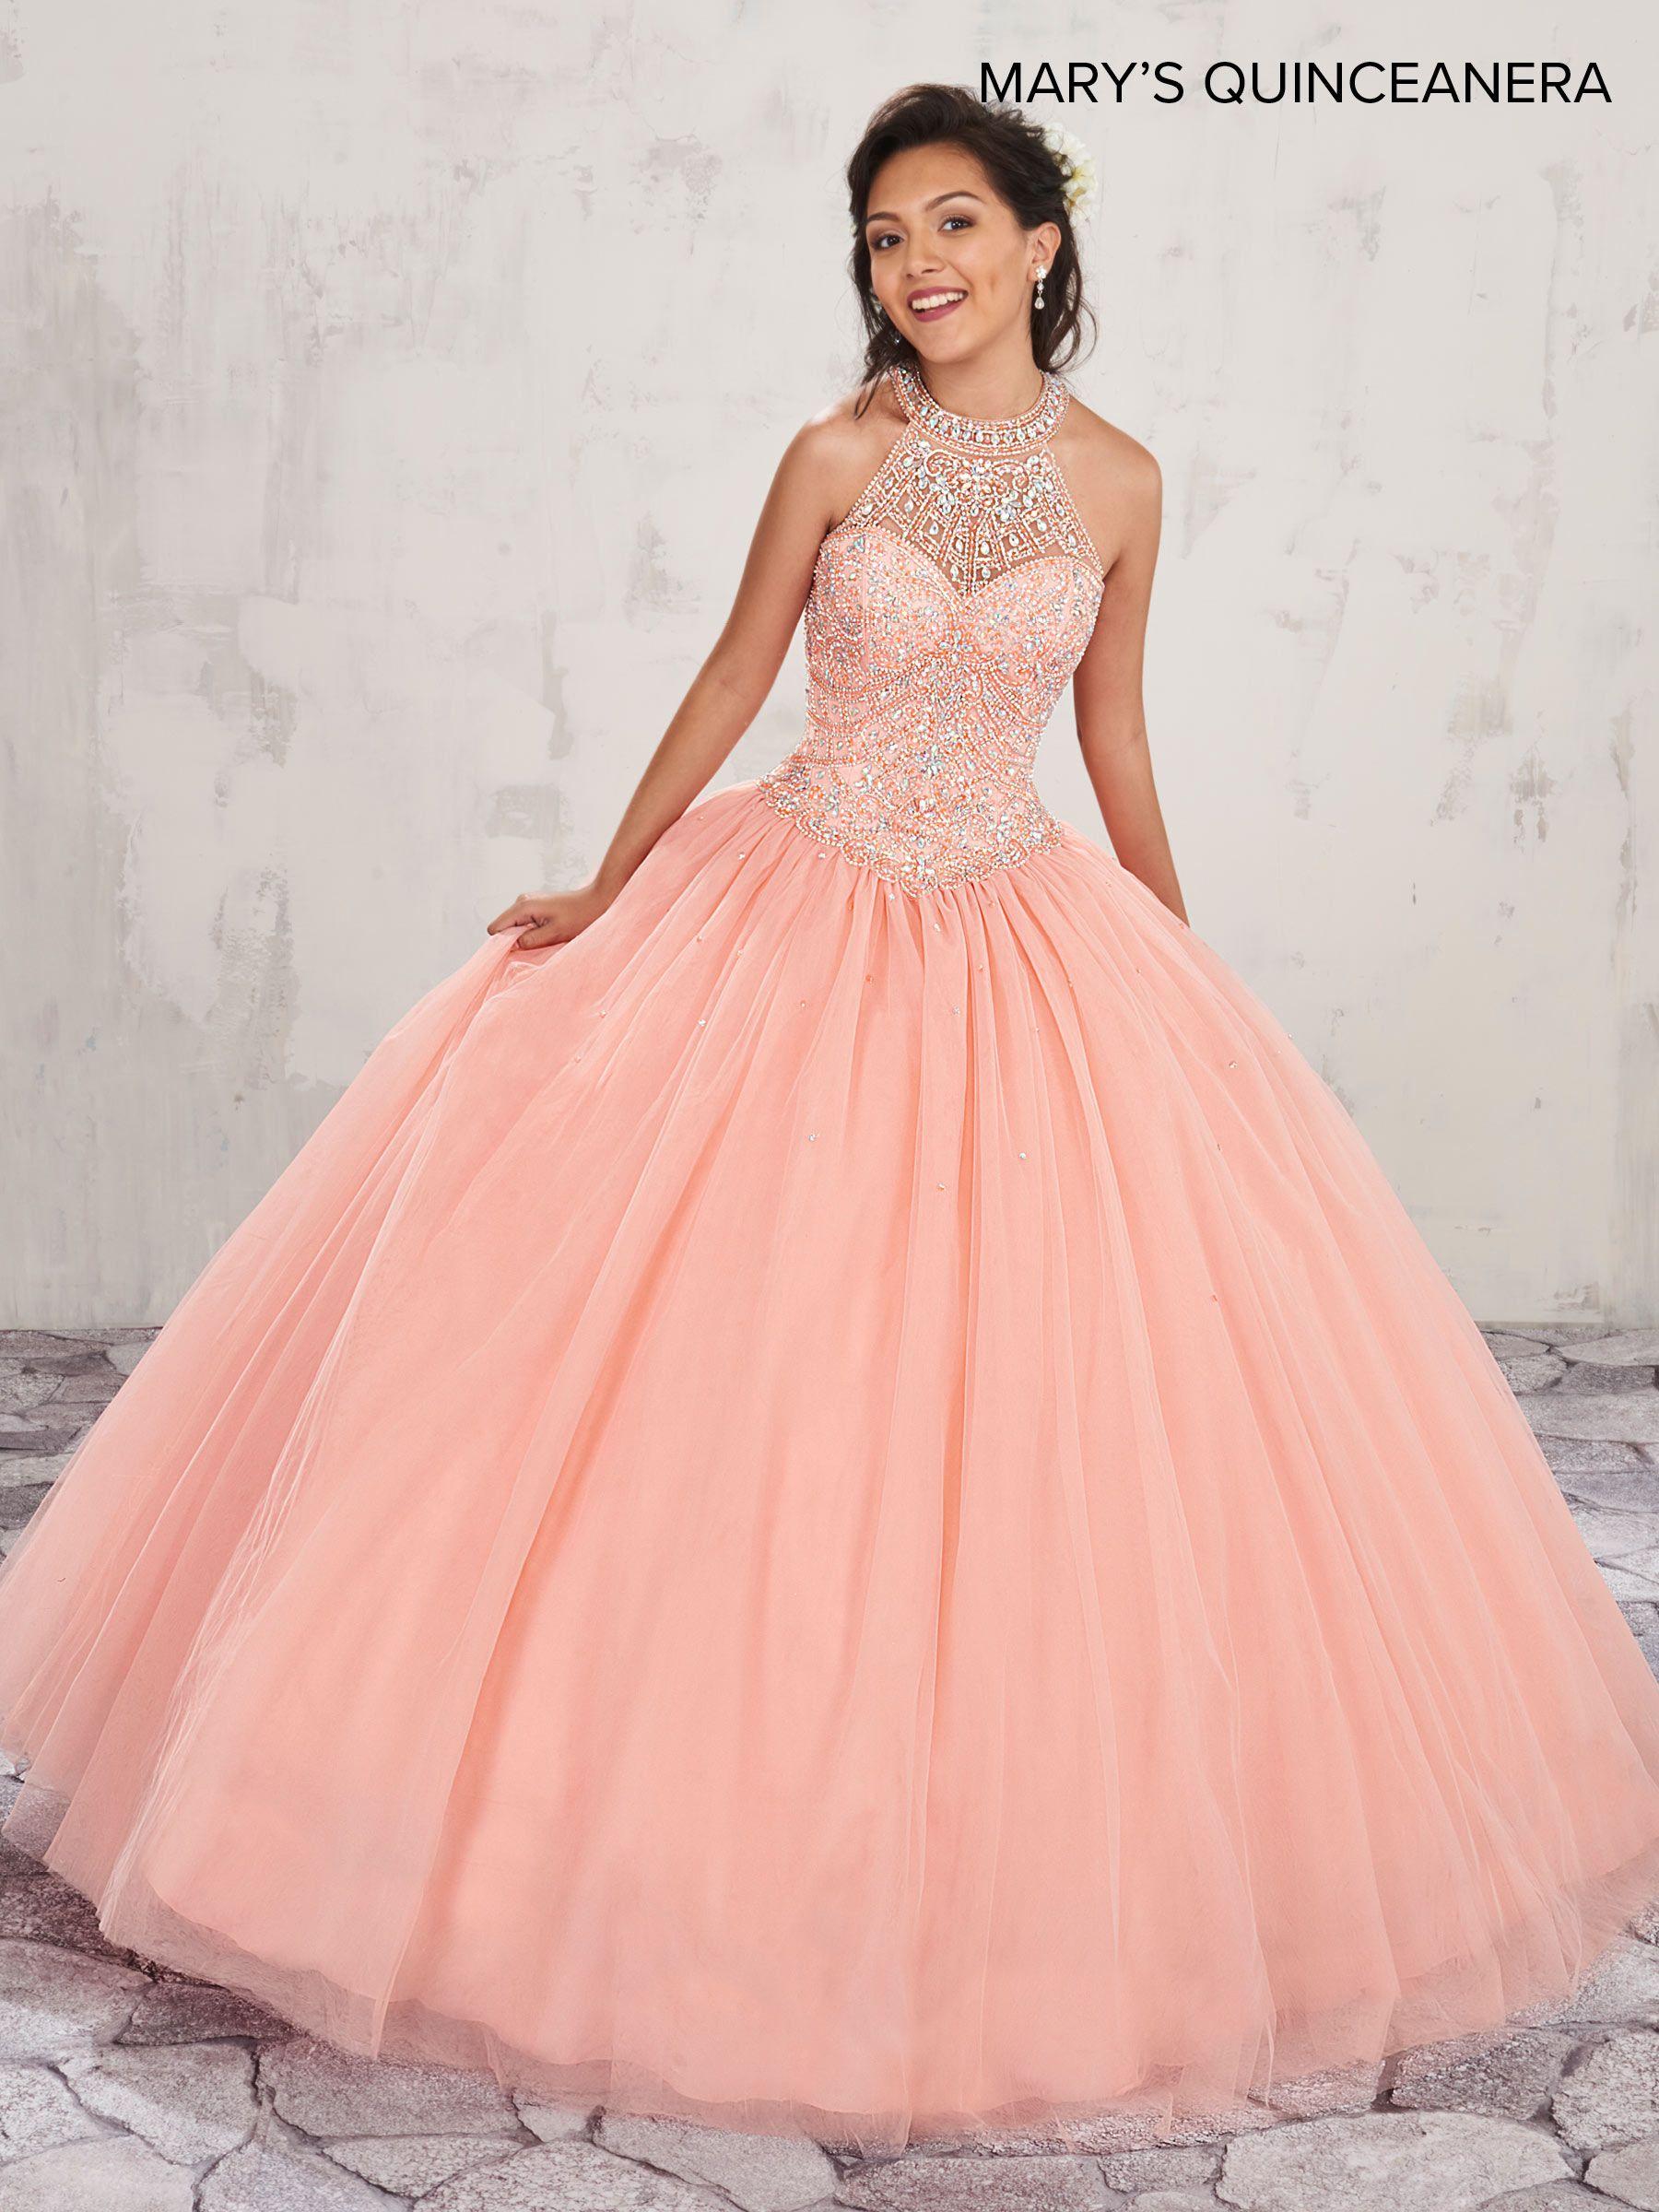 Robe de quinceanera rose